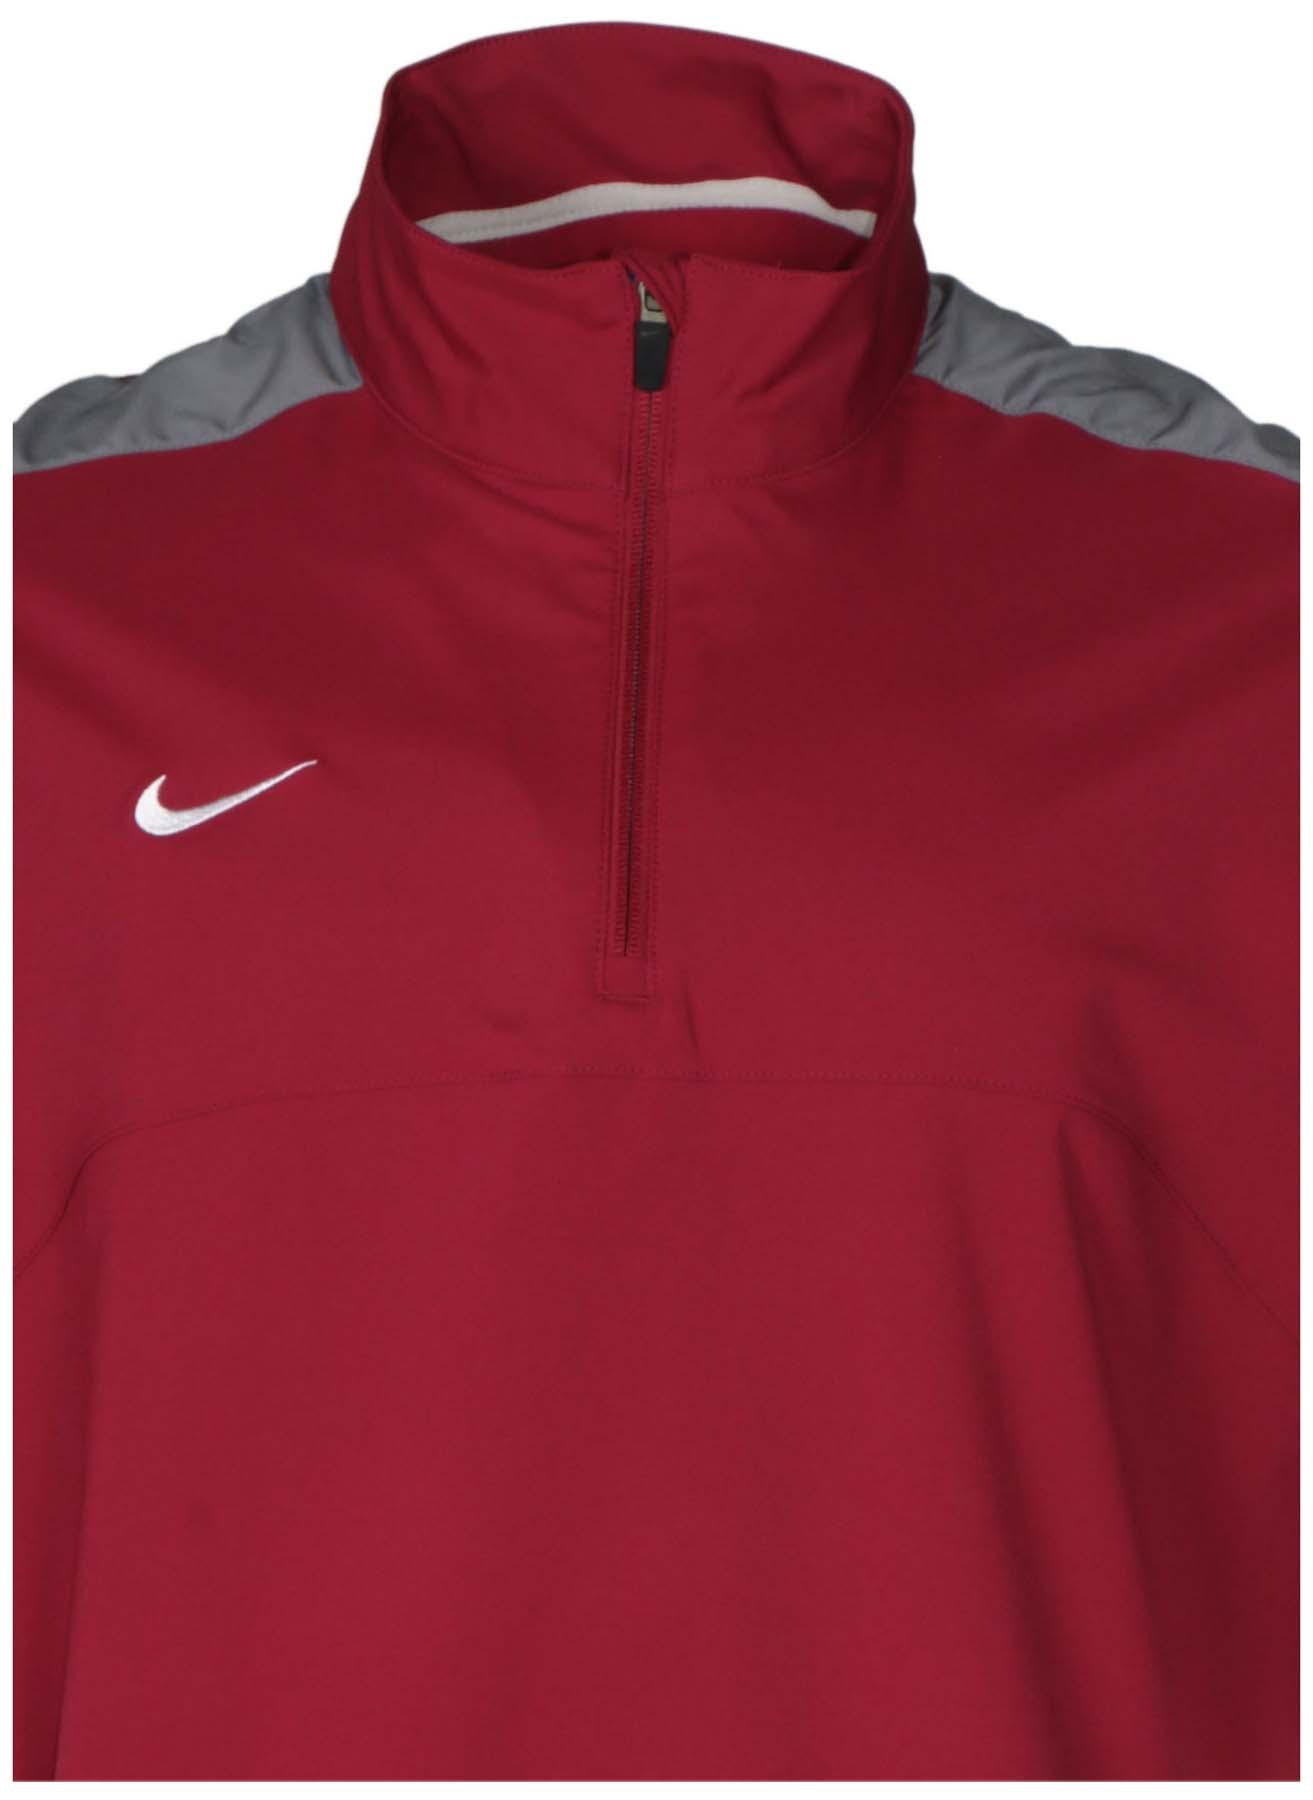 9fc4cf425608 Nike Men s Dri-Fit 1 4 Zip Short Sleeve Training Jacket